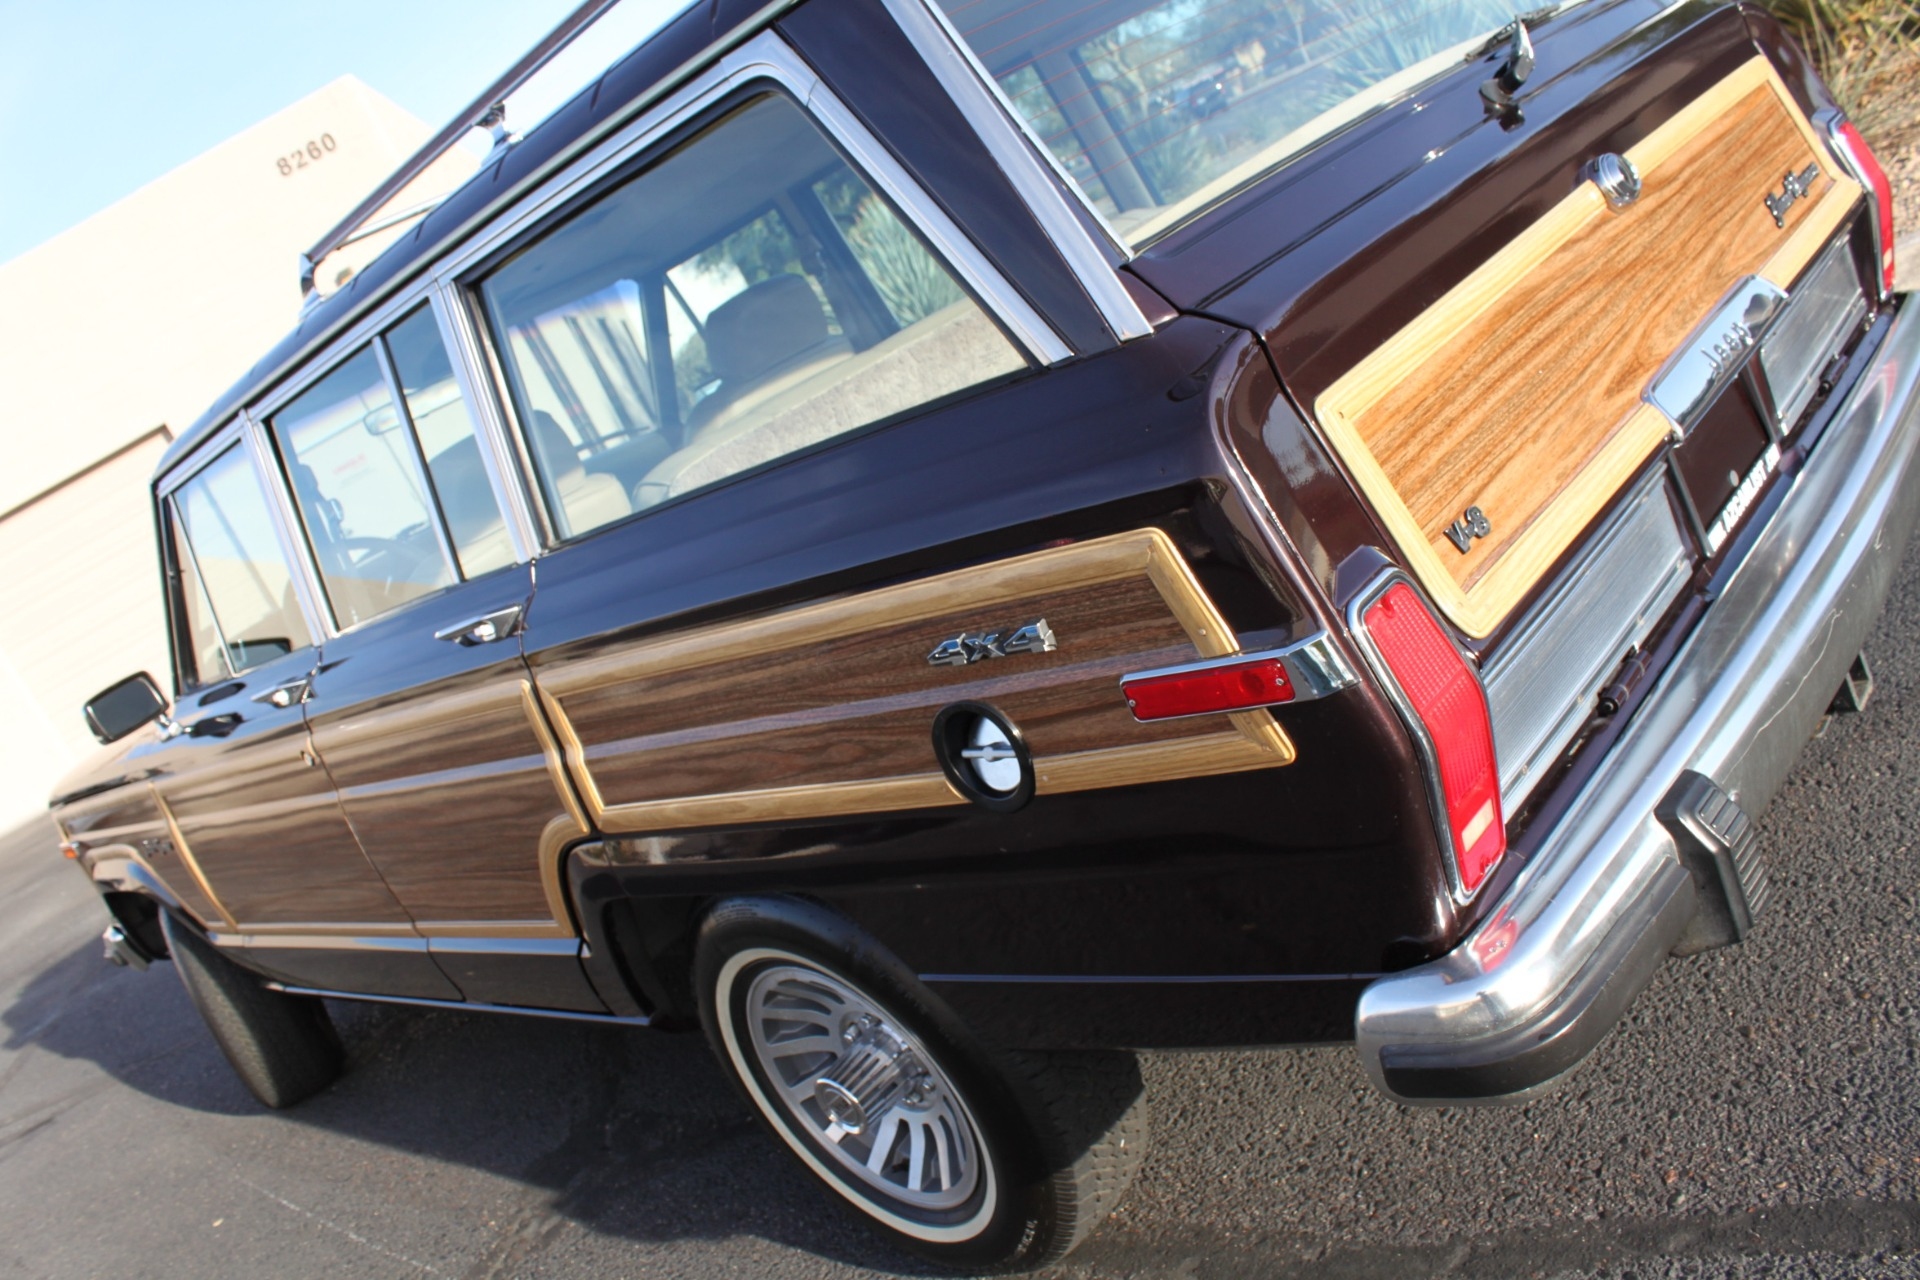 Used-1990-Jeep-Grand-Wagoneer-4X4-Grand-Wagoneer